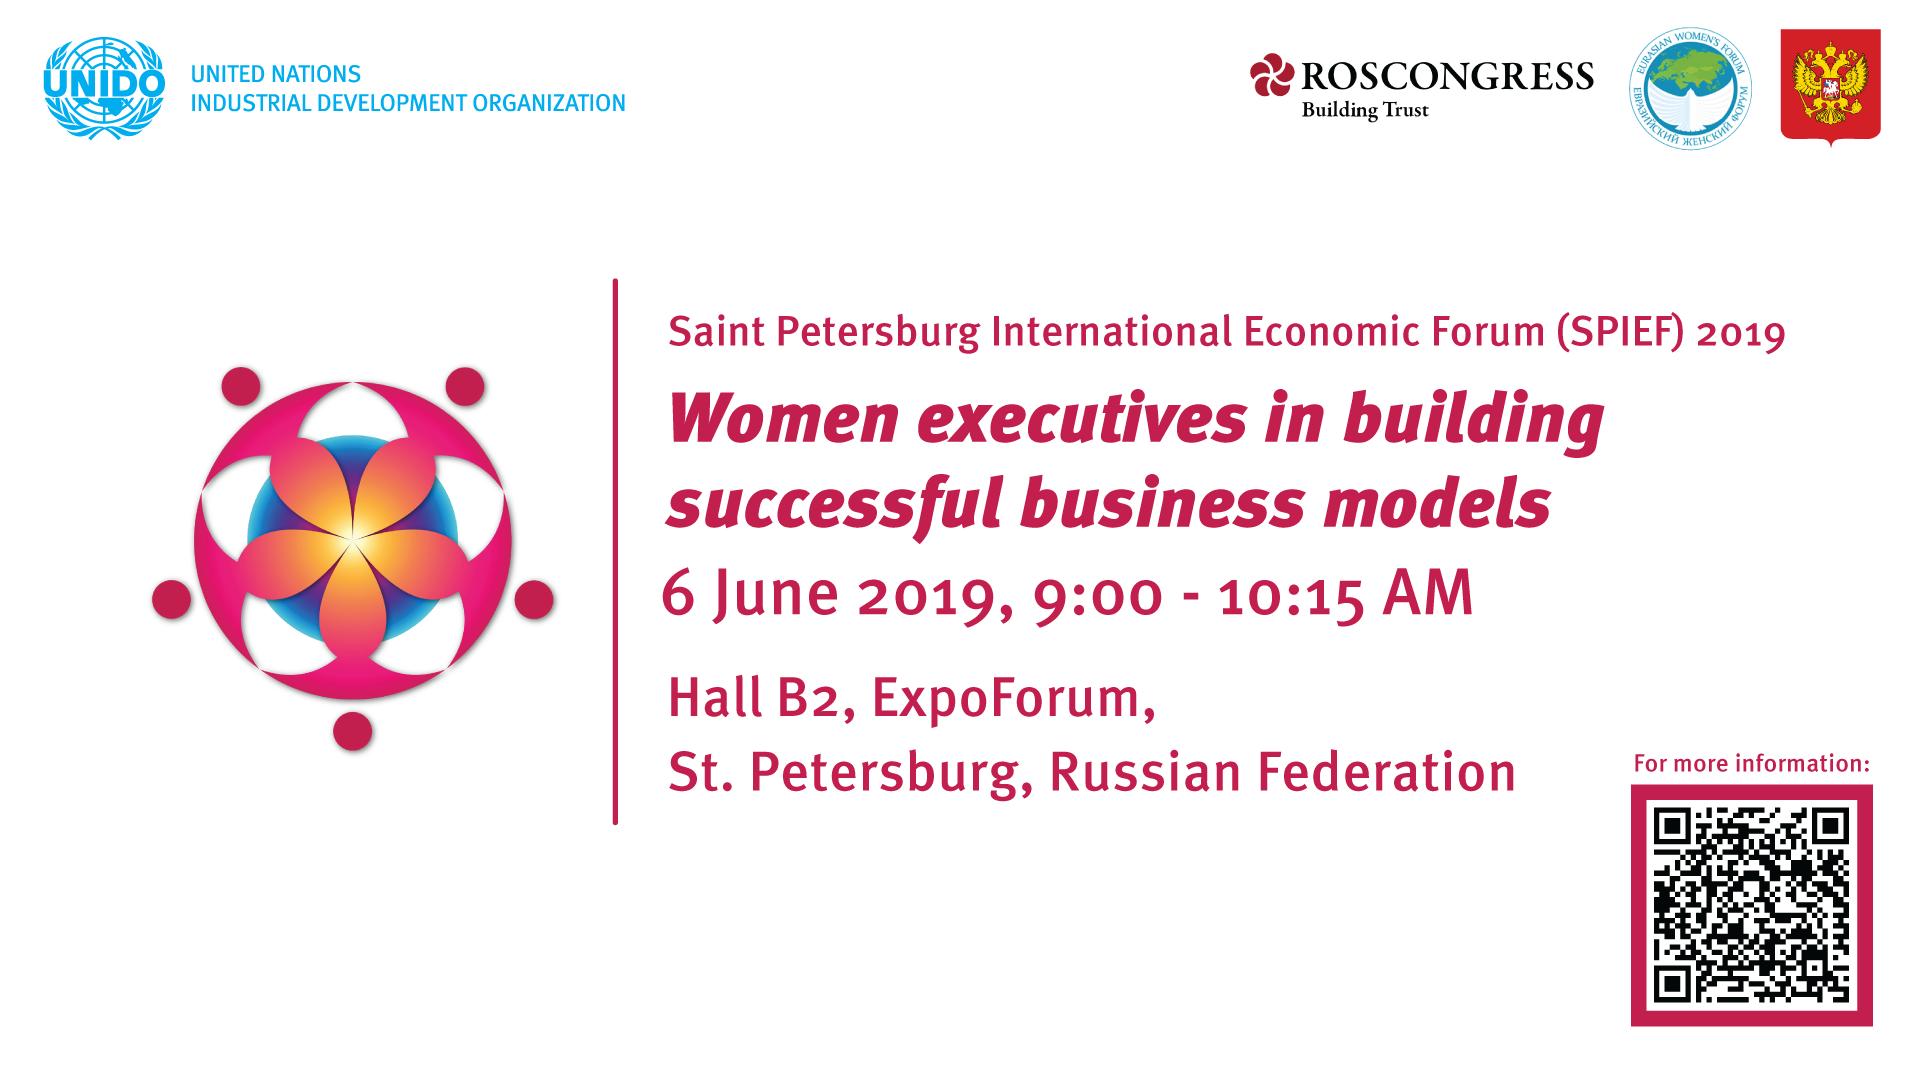 UNIDO at SPIEF 2019: Women executives in building successful